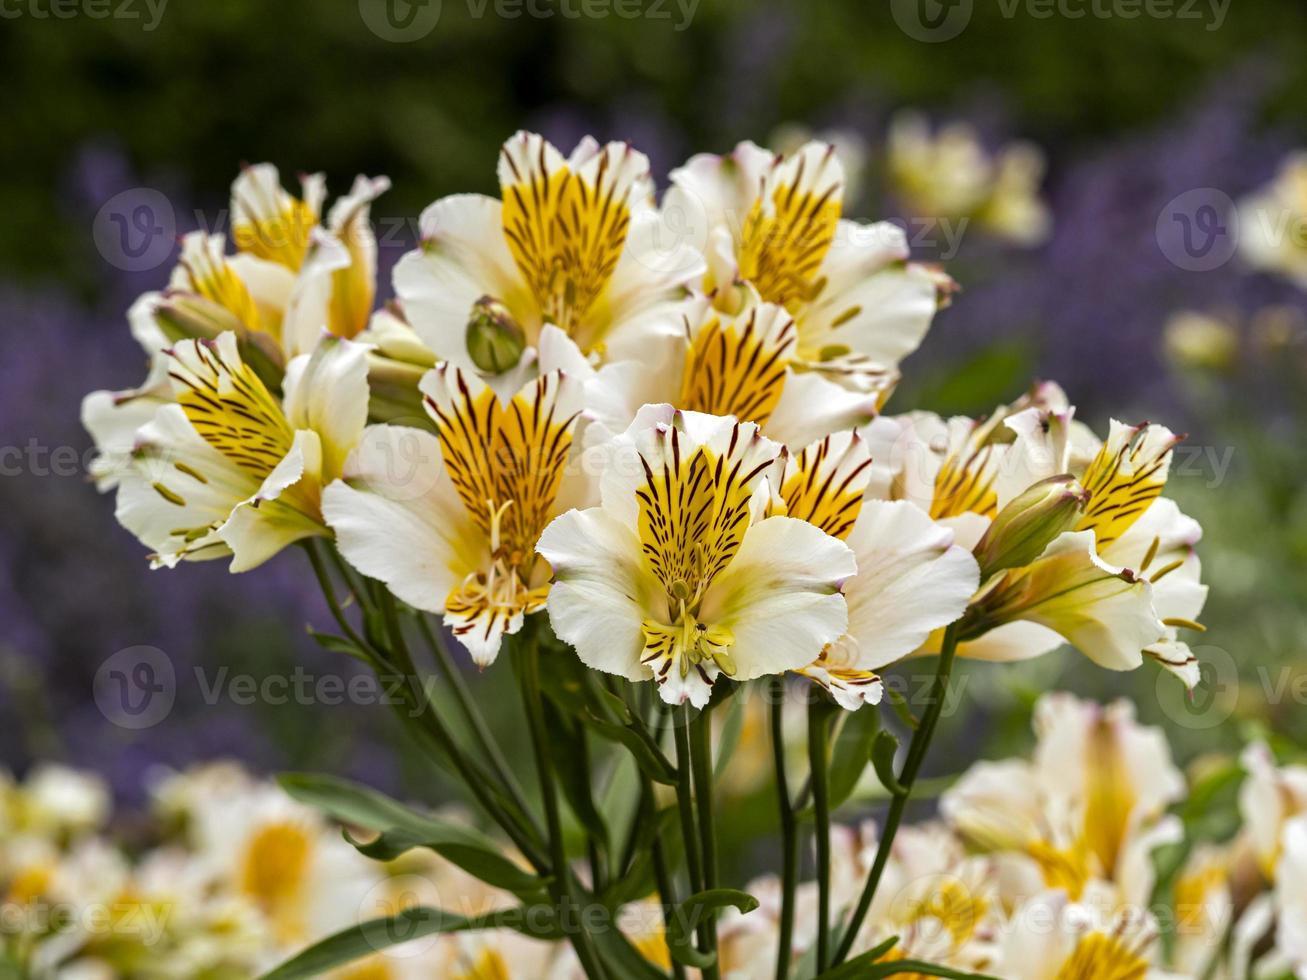 Lys péruviens alstroemeria blanc et jaune photo